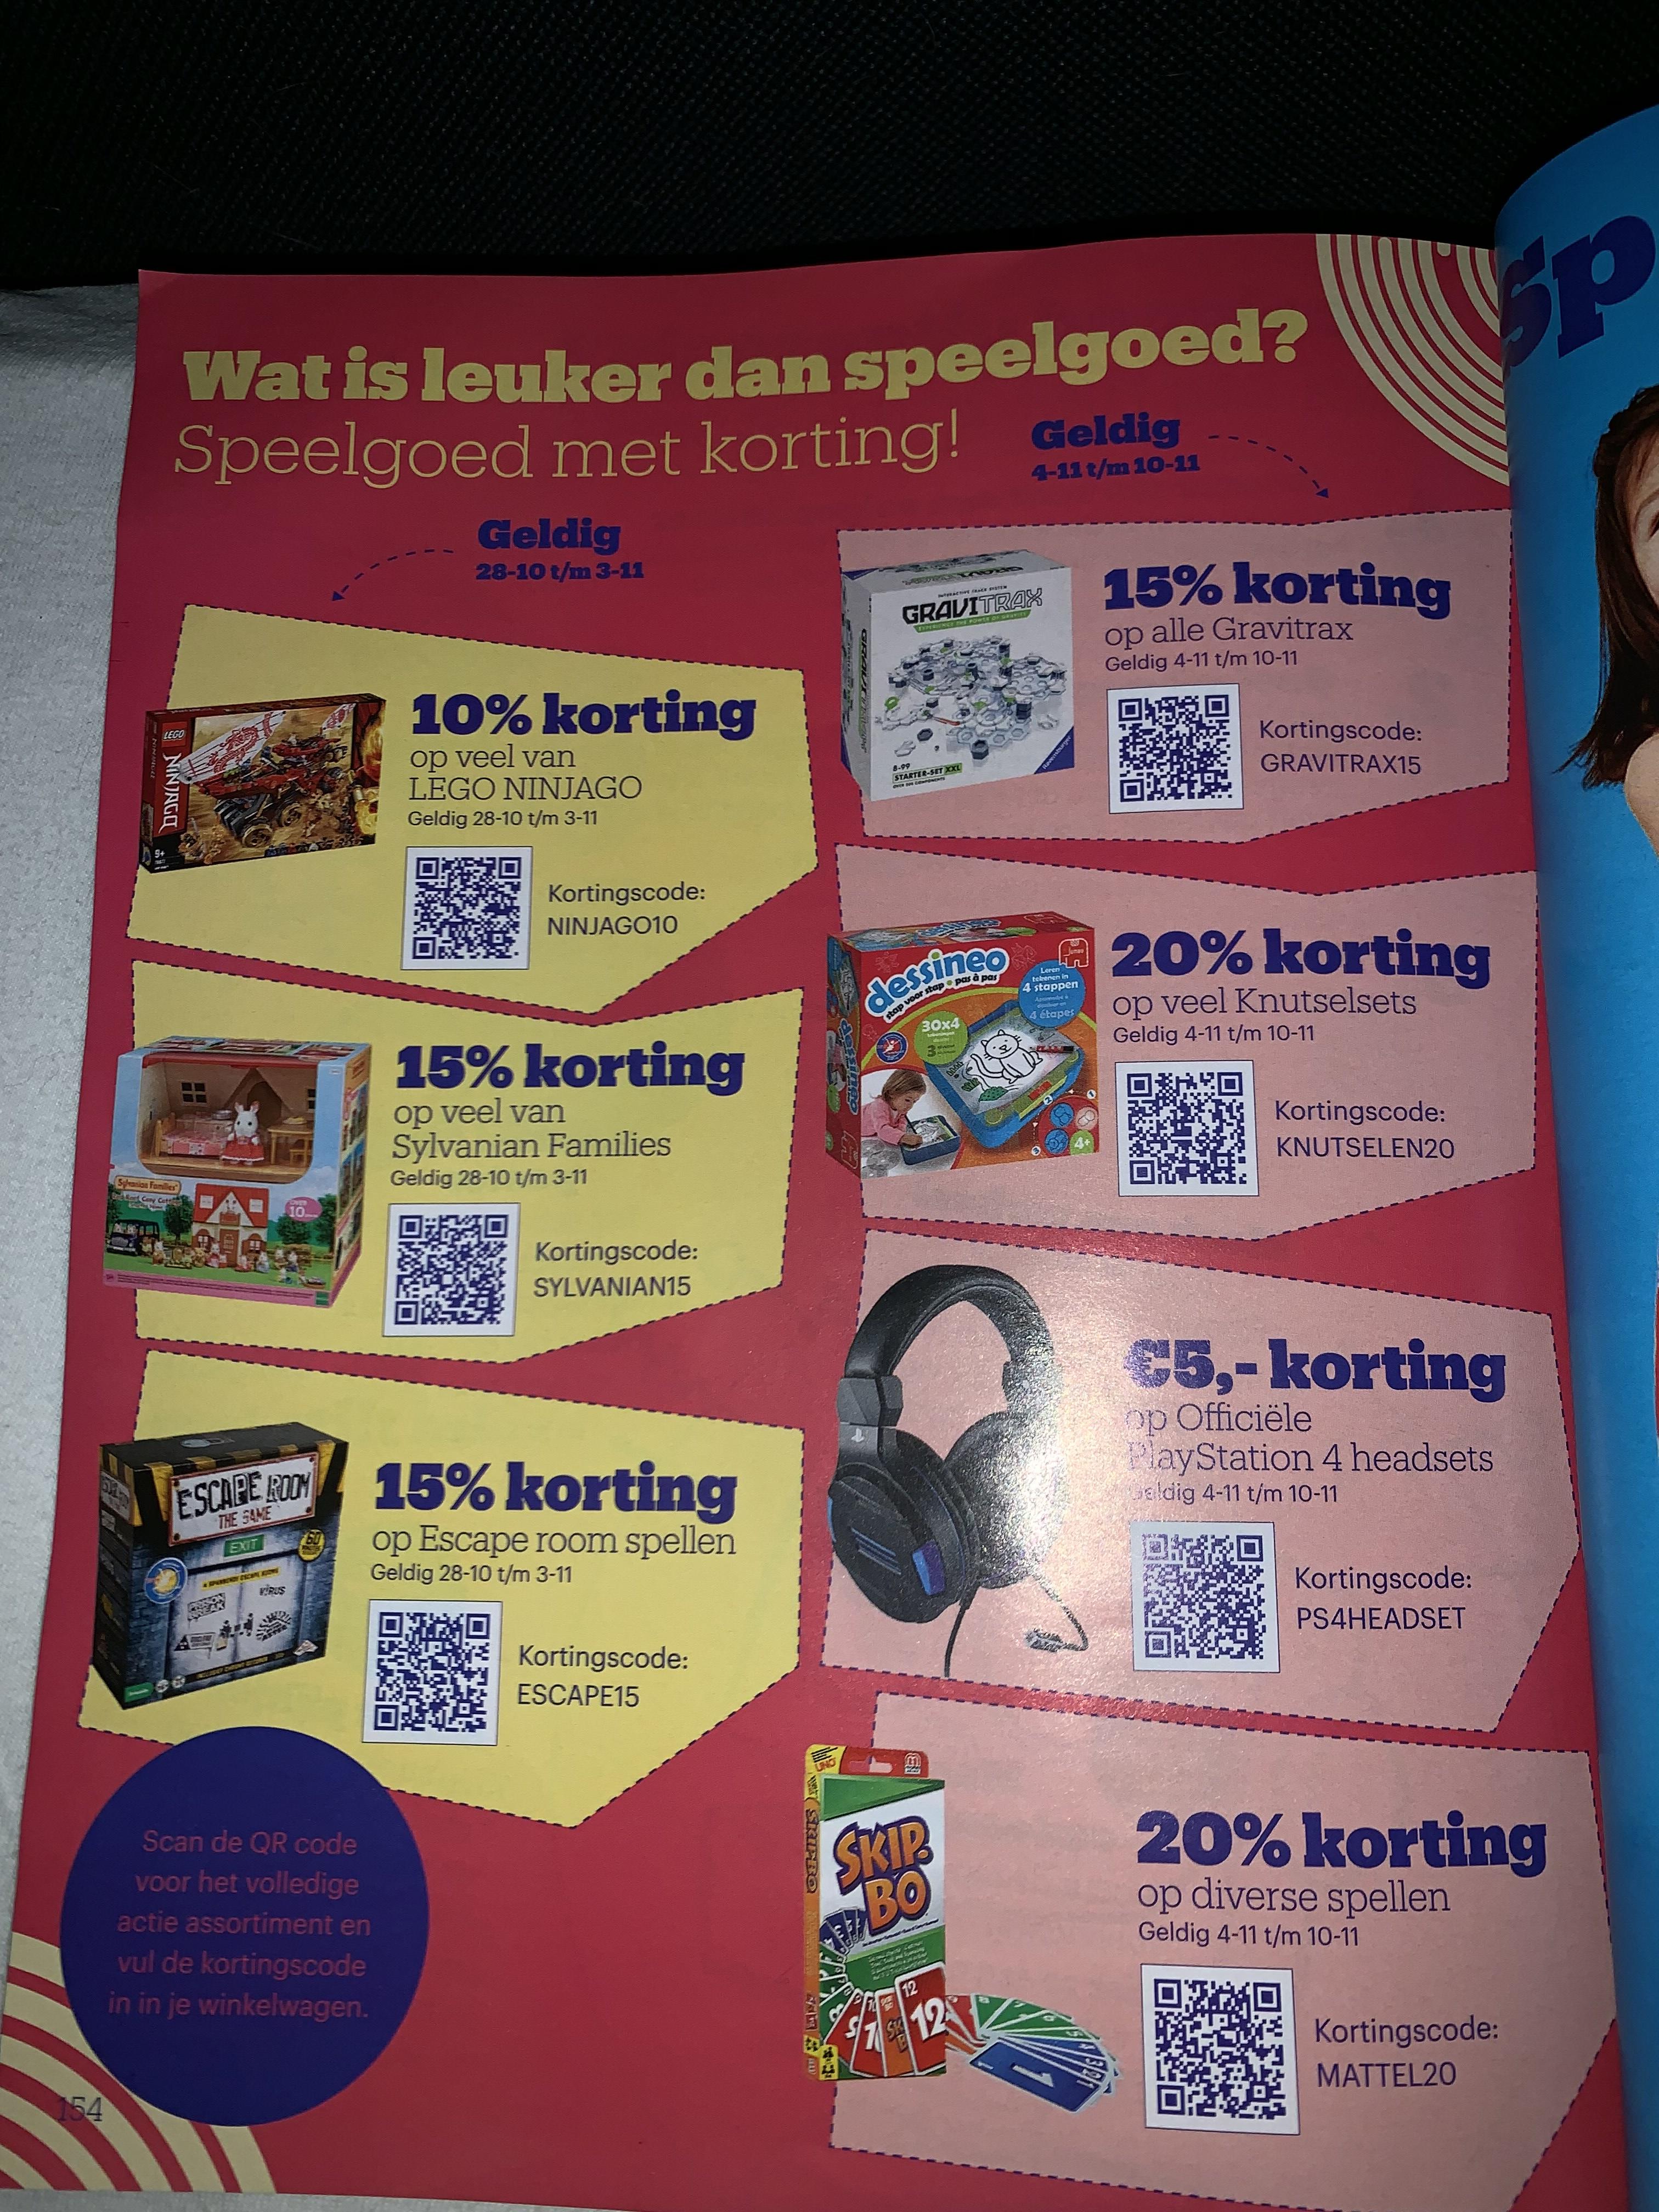 7 kortingscodes bij Bol.com op speelgoed en Playstation Headsets